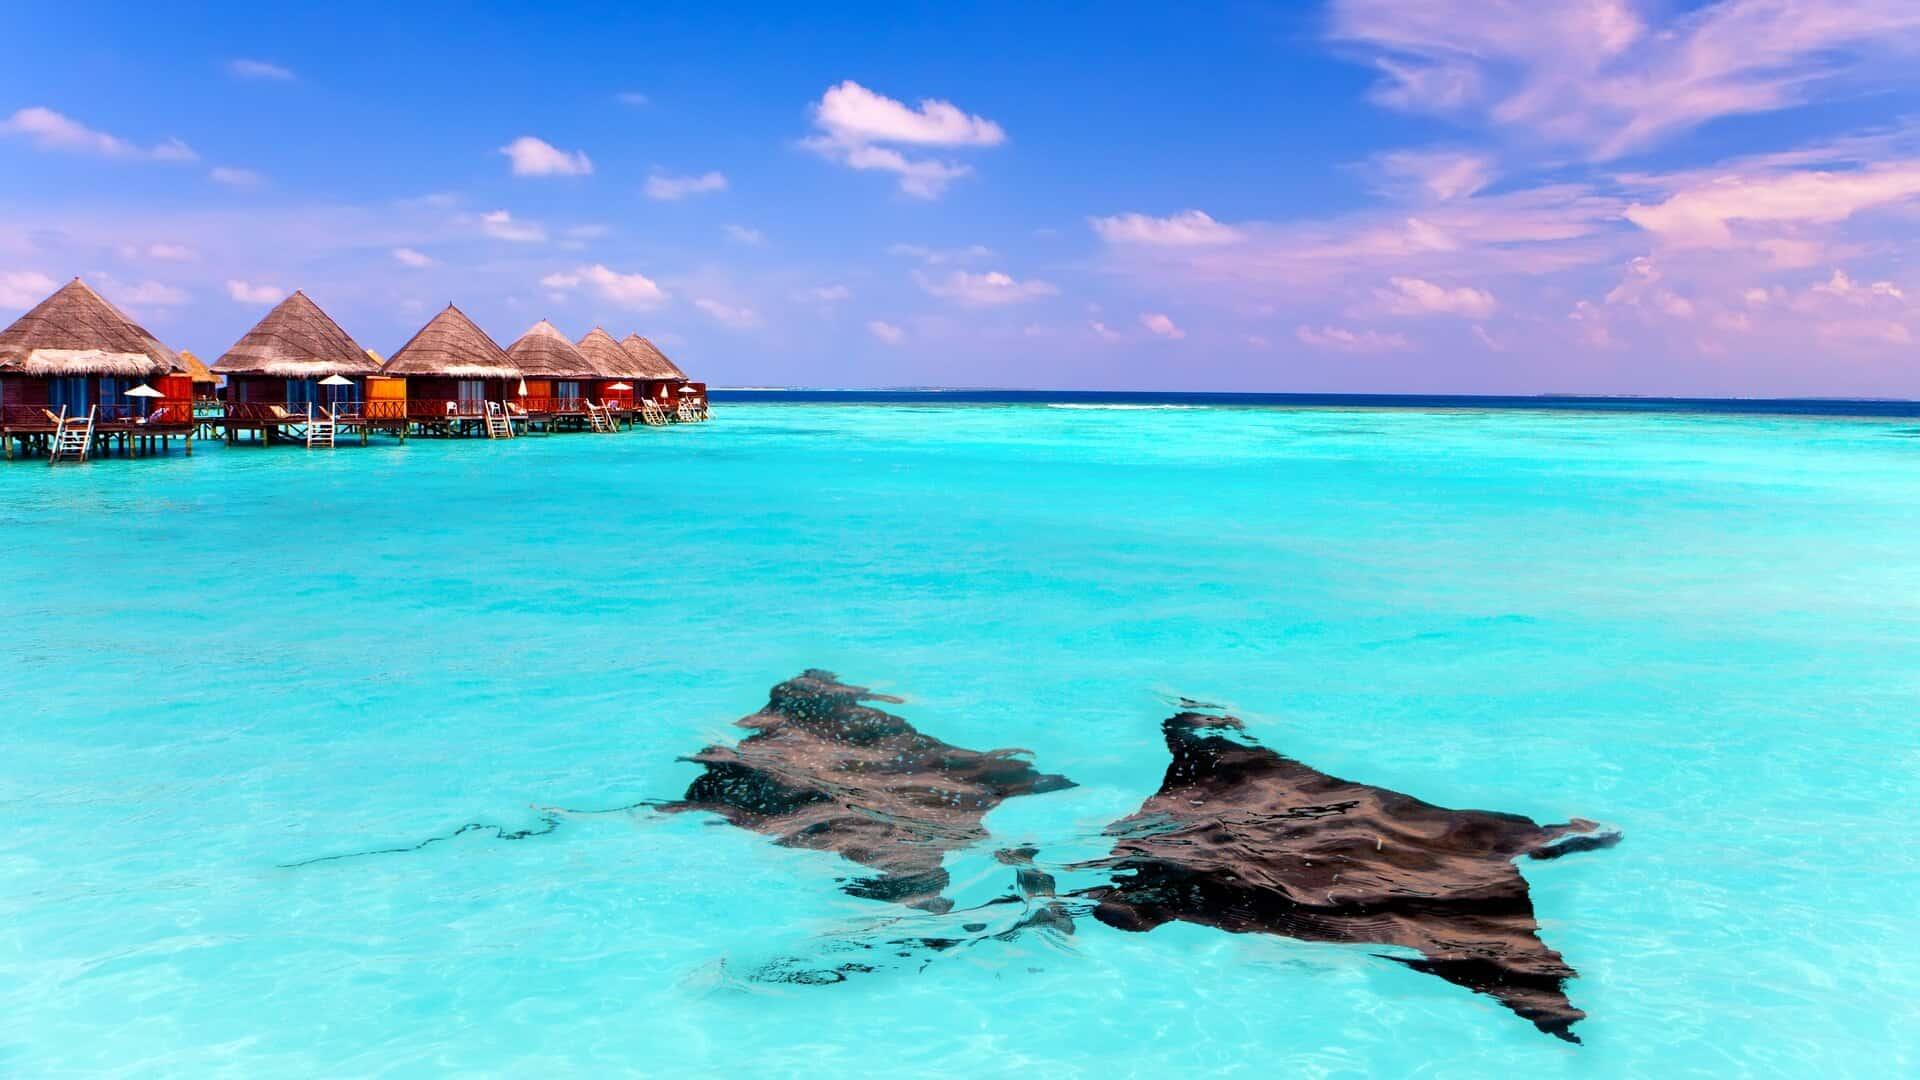 Choosing a hotel in the Maldives